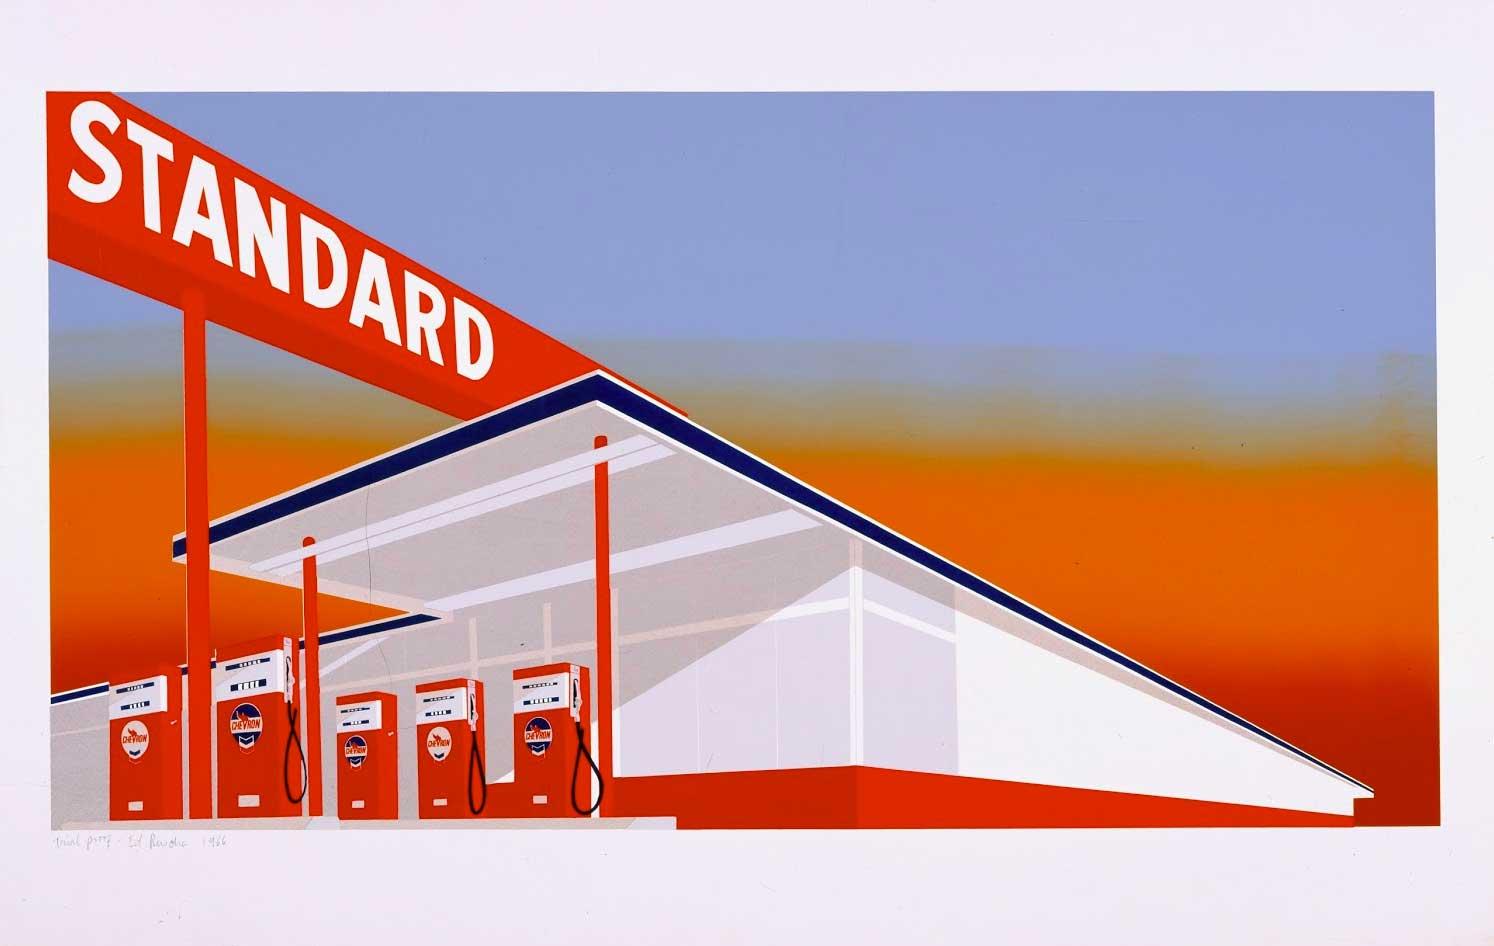 Ed Ruscha,Standard Station,1966, Color screen print. Published by Audrey Sabol, Villanova, PA, Fine Arts Museums of San Francisco. © Ed Ruscha